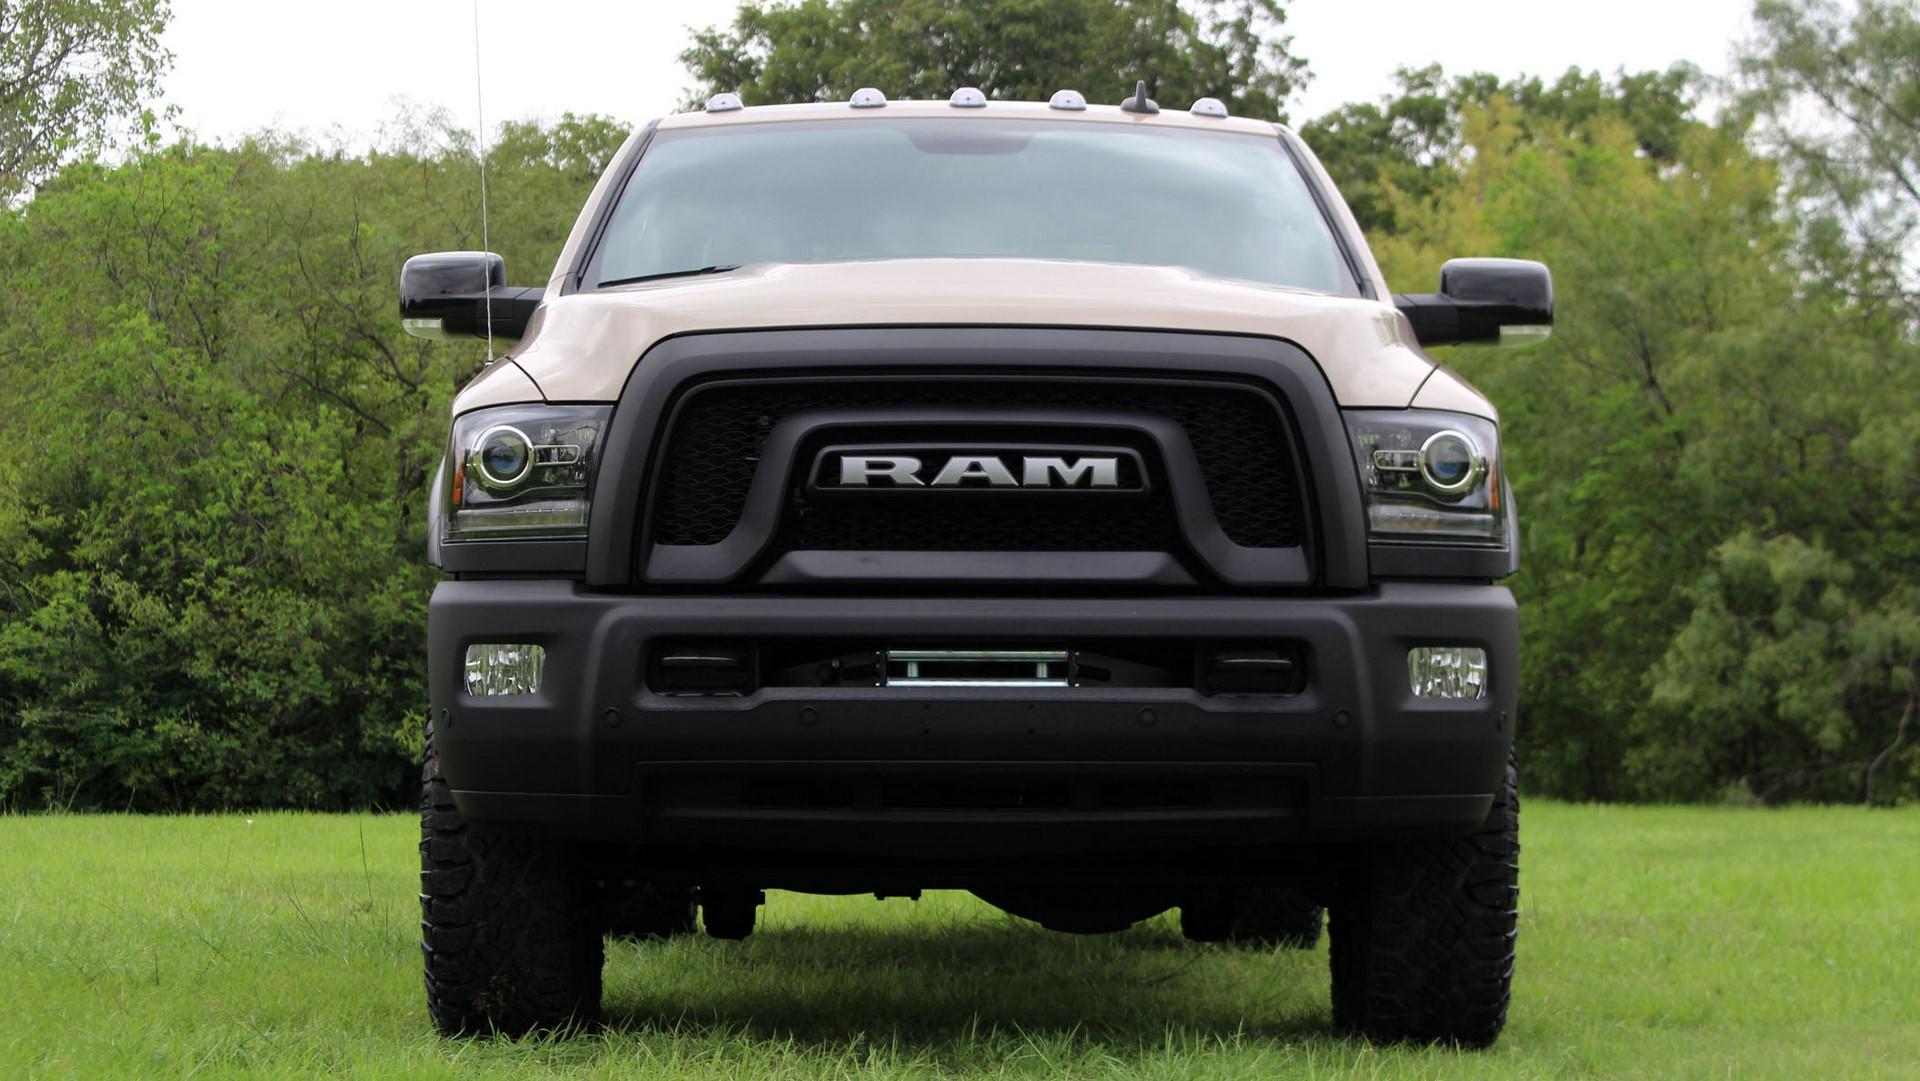 ram-2500-powerwagon-front-grille-4-1